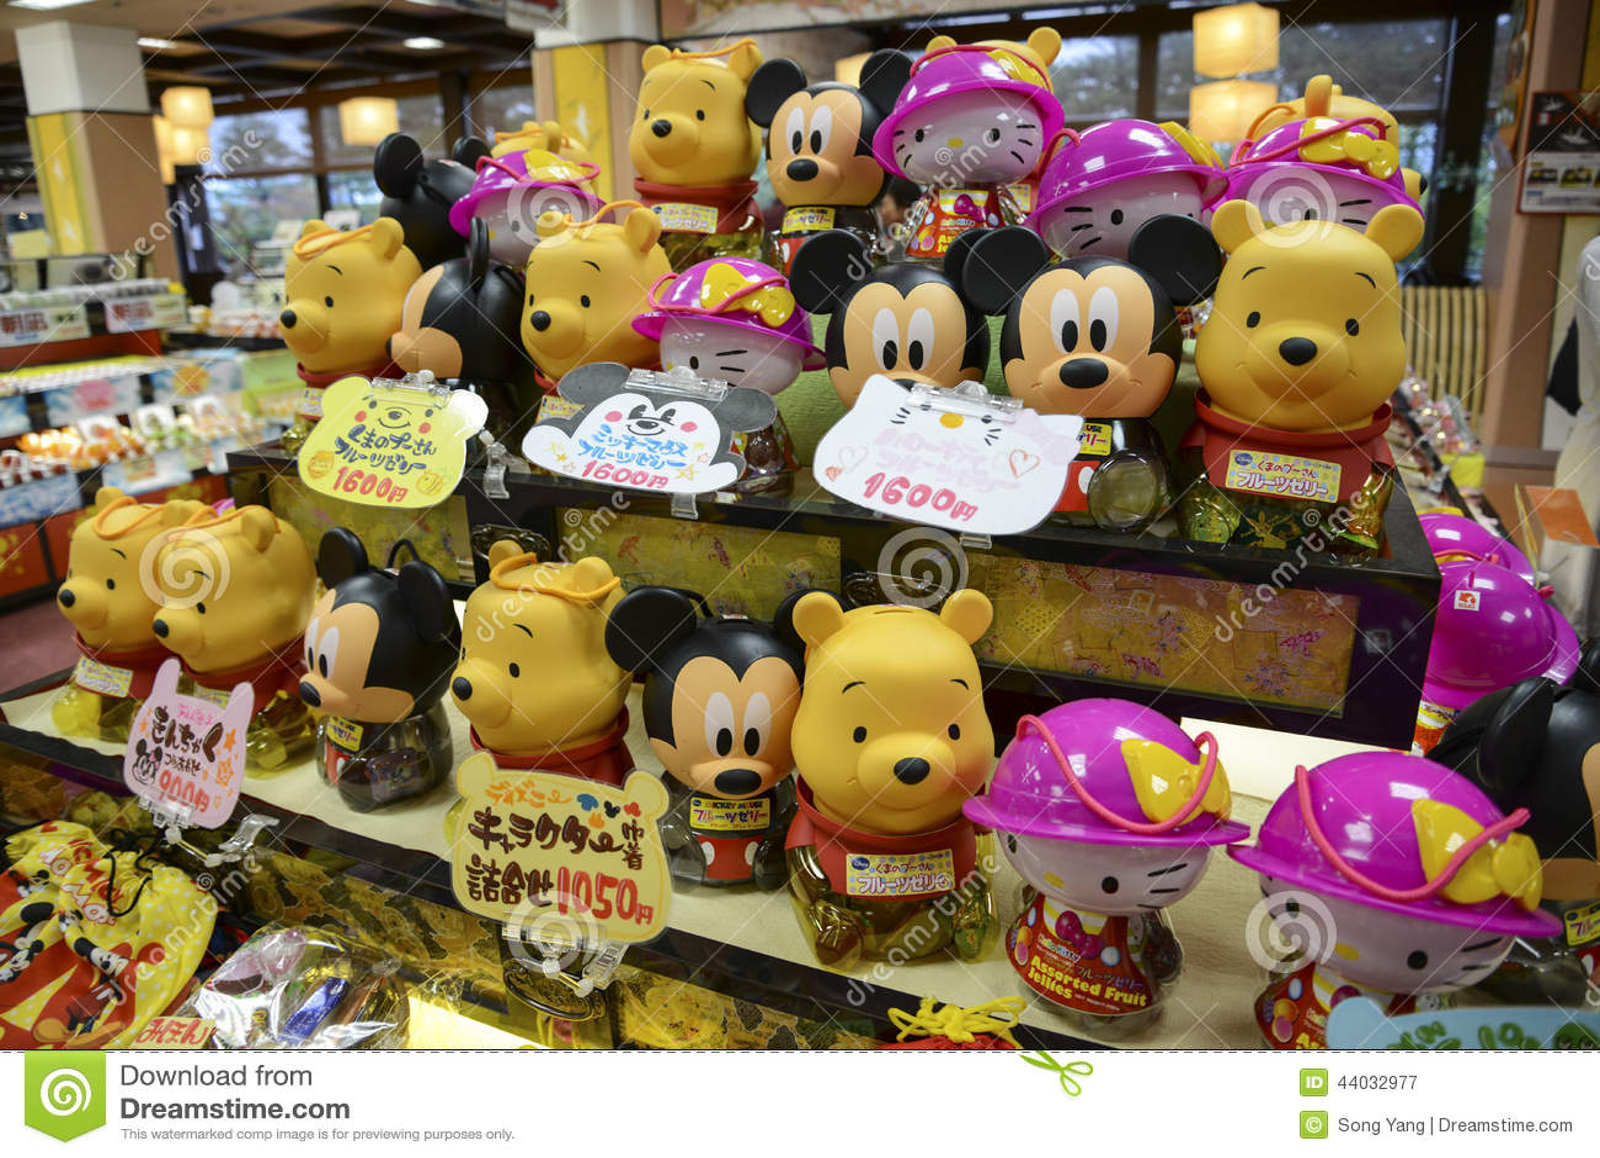 Disney Store Toys : Disney toy shop editorial photography image of carton